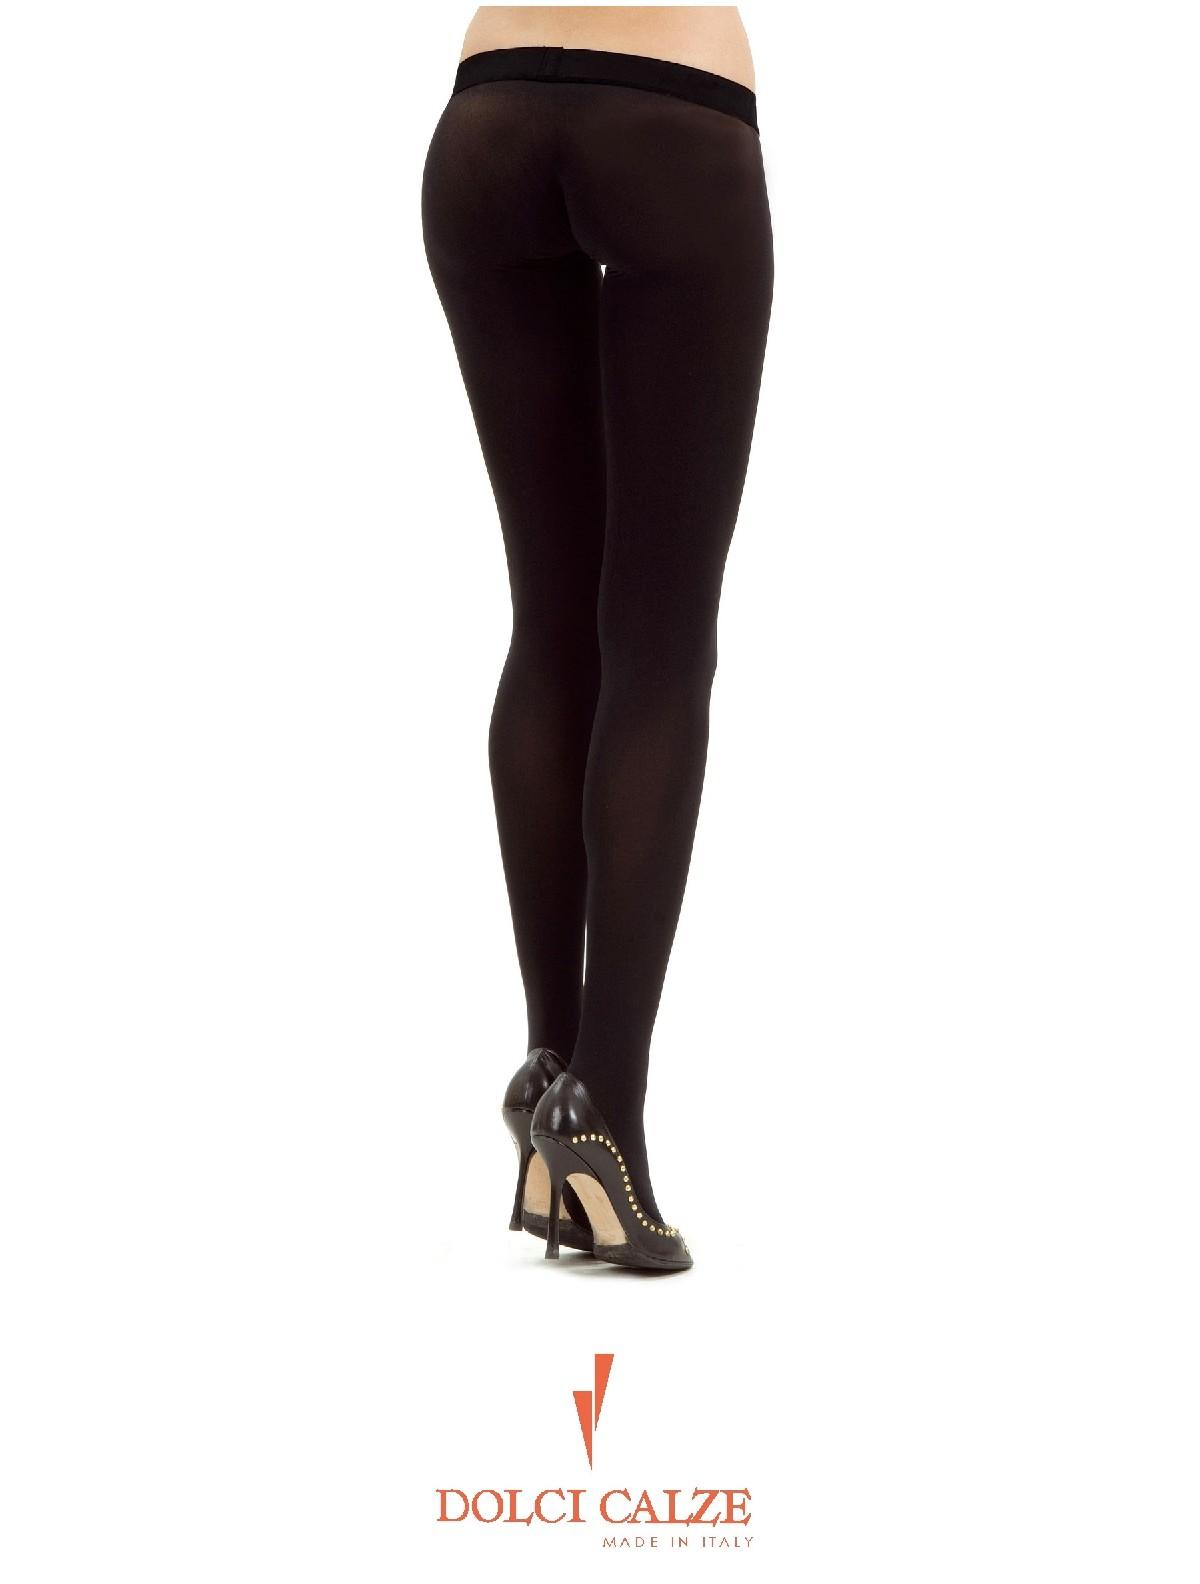 dolci calze collant femme 80 nahtlose strumpfhose. Black Bedroom Furniture Sets. Home Design Ideas